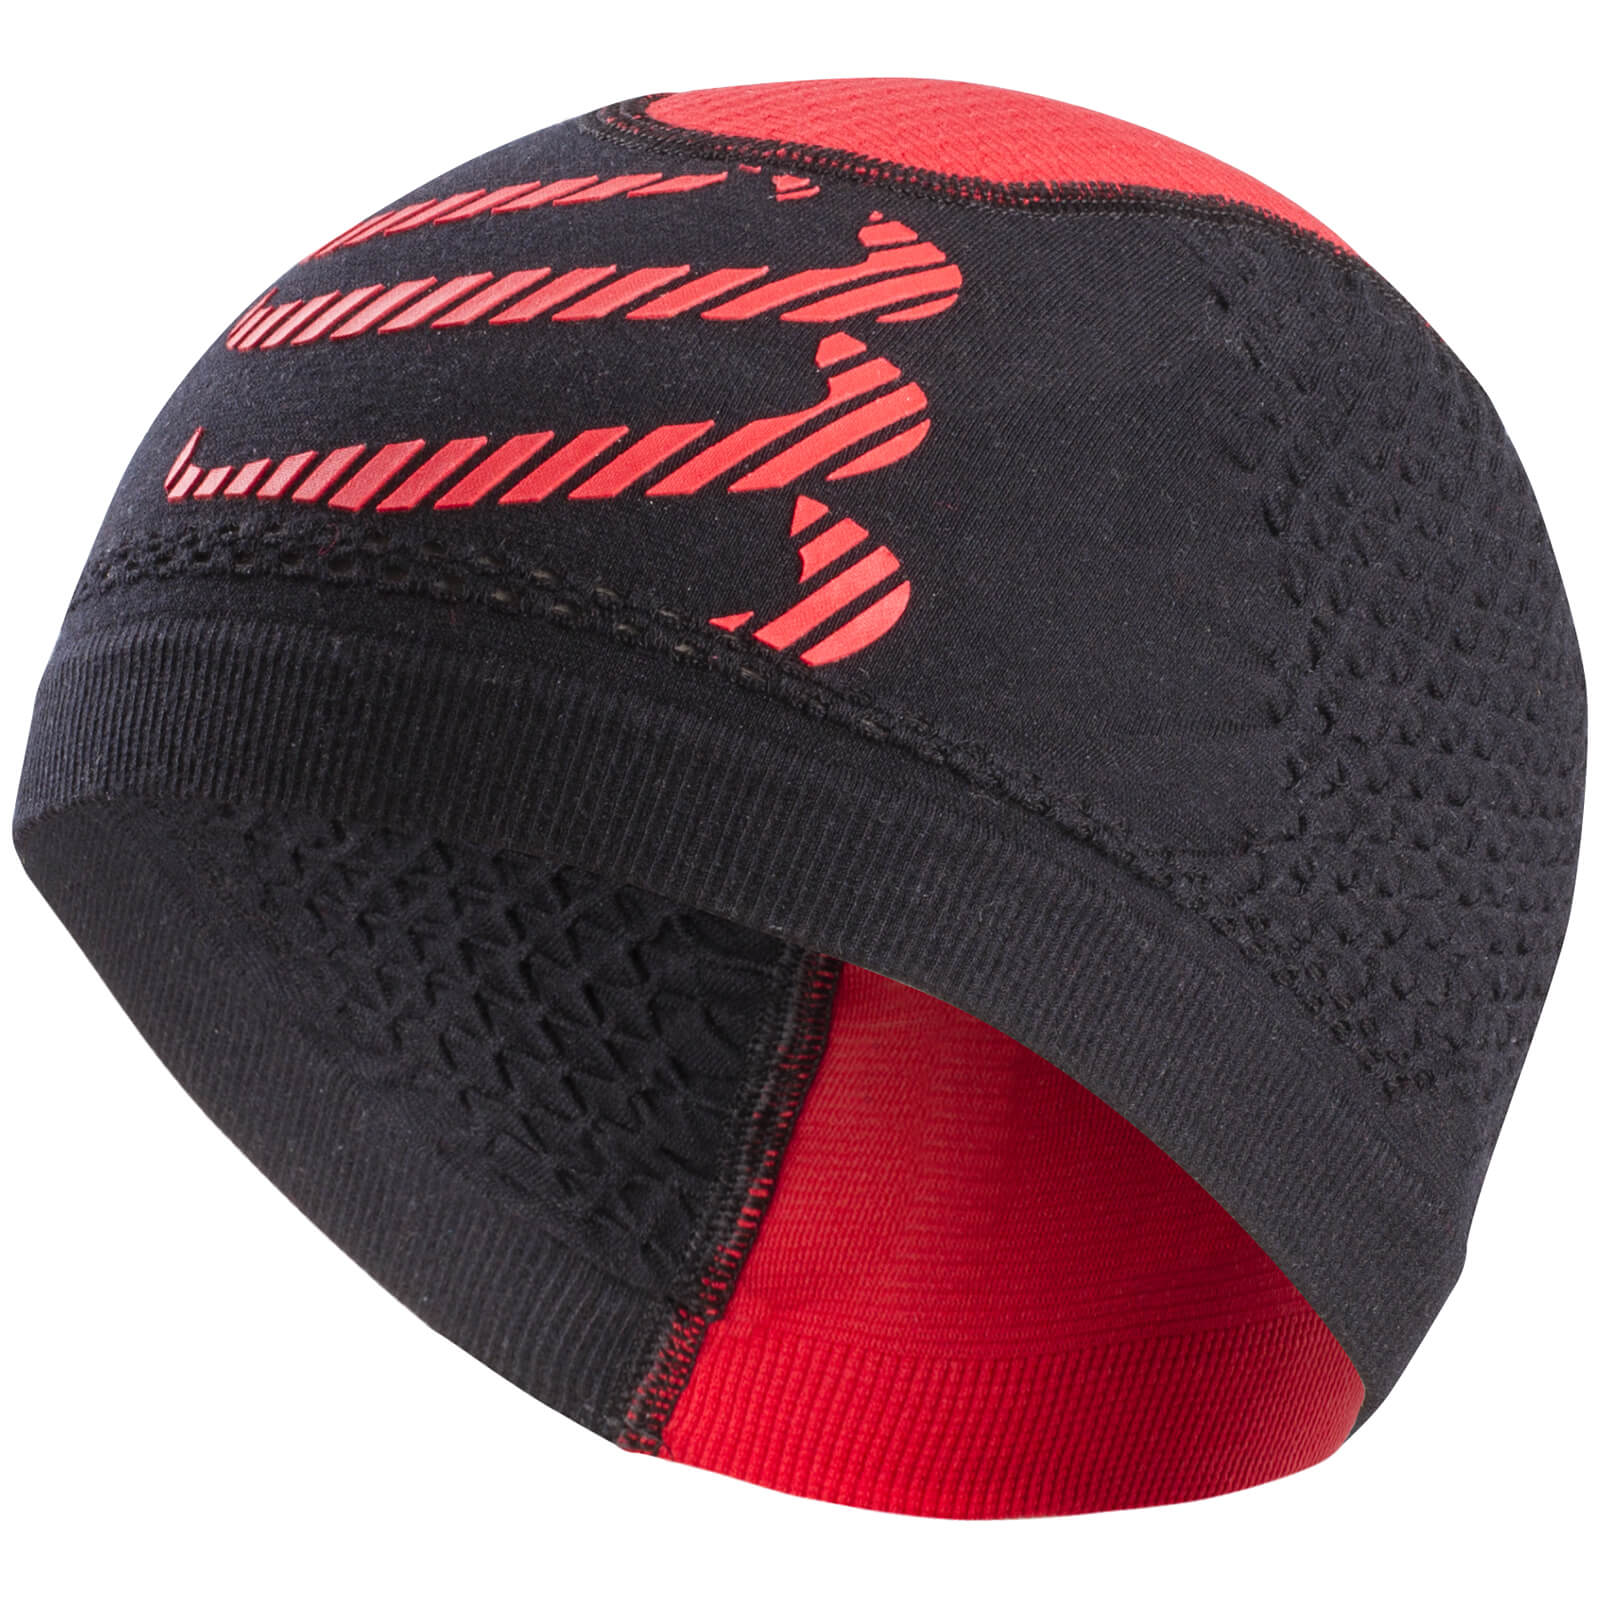 fddf0e99b3f Compressport Seamless Beanie Hat - Black